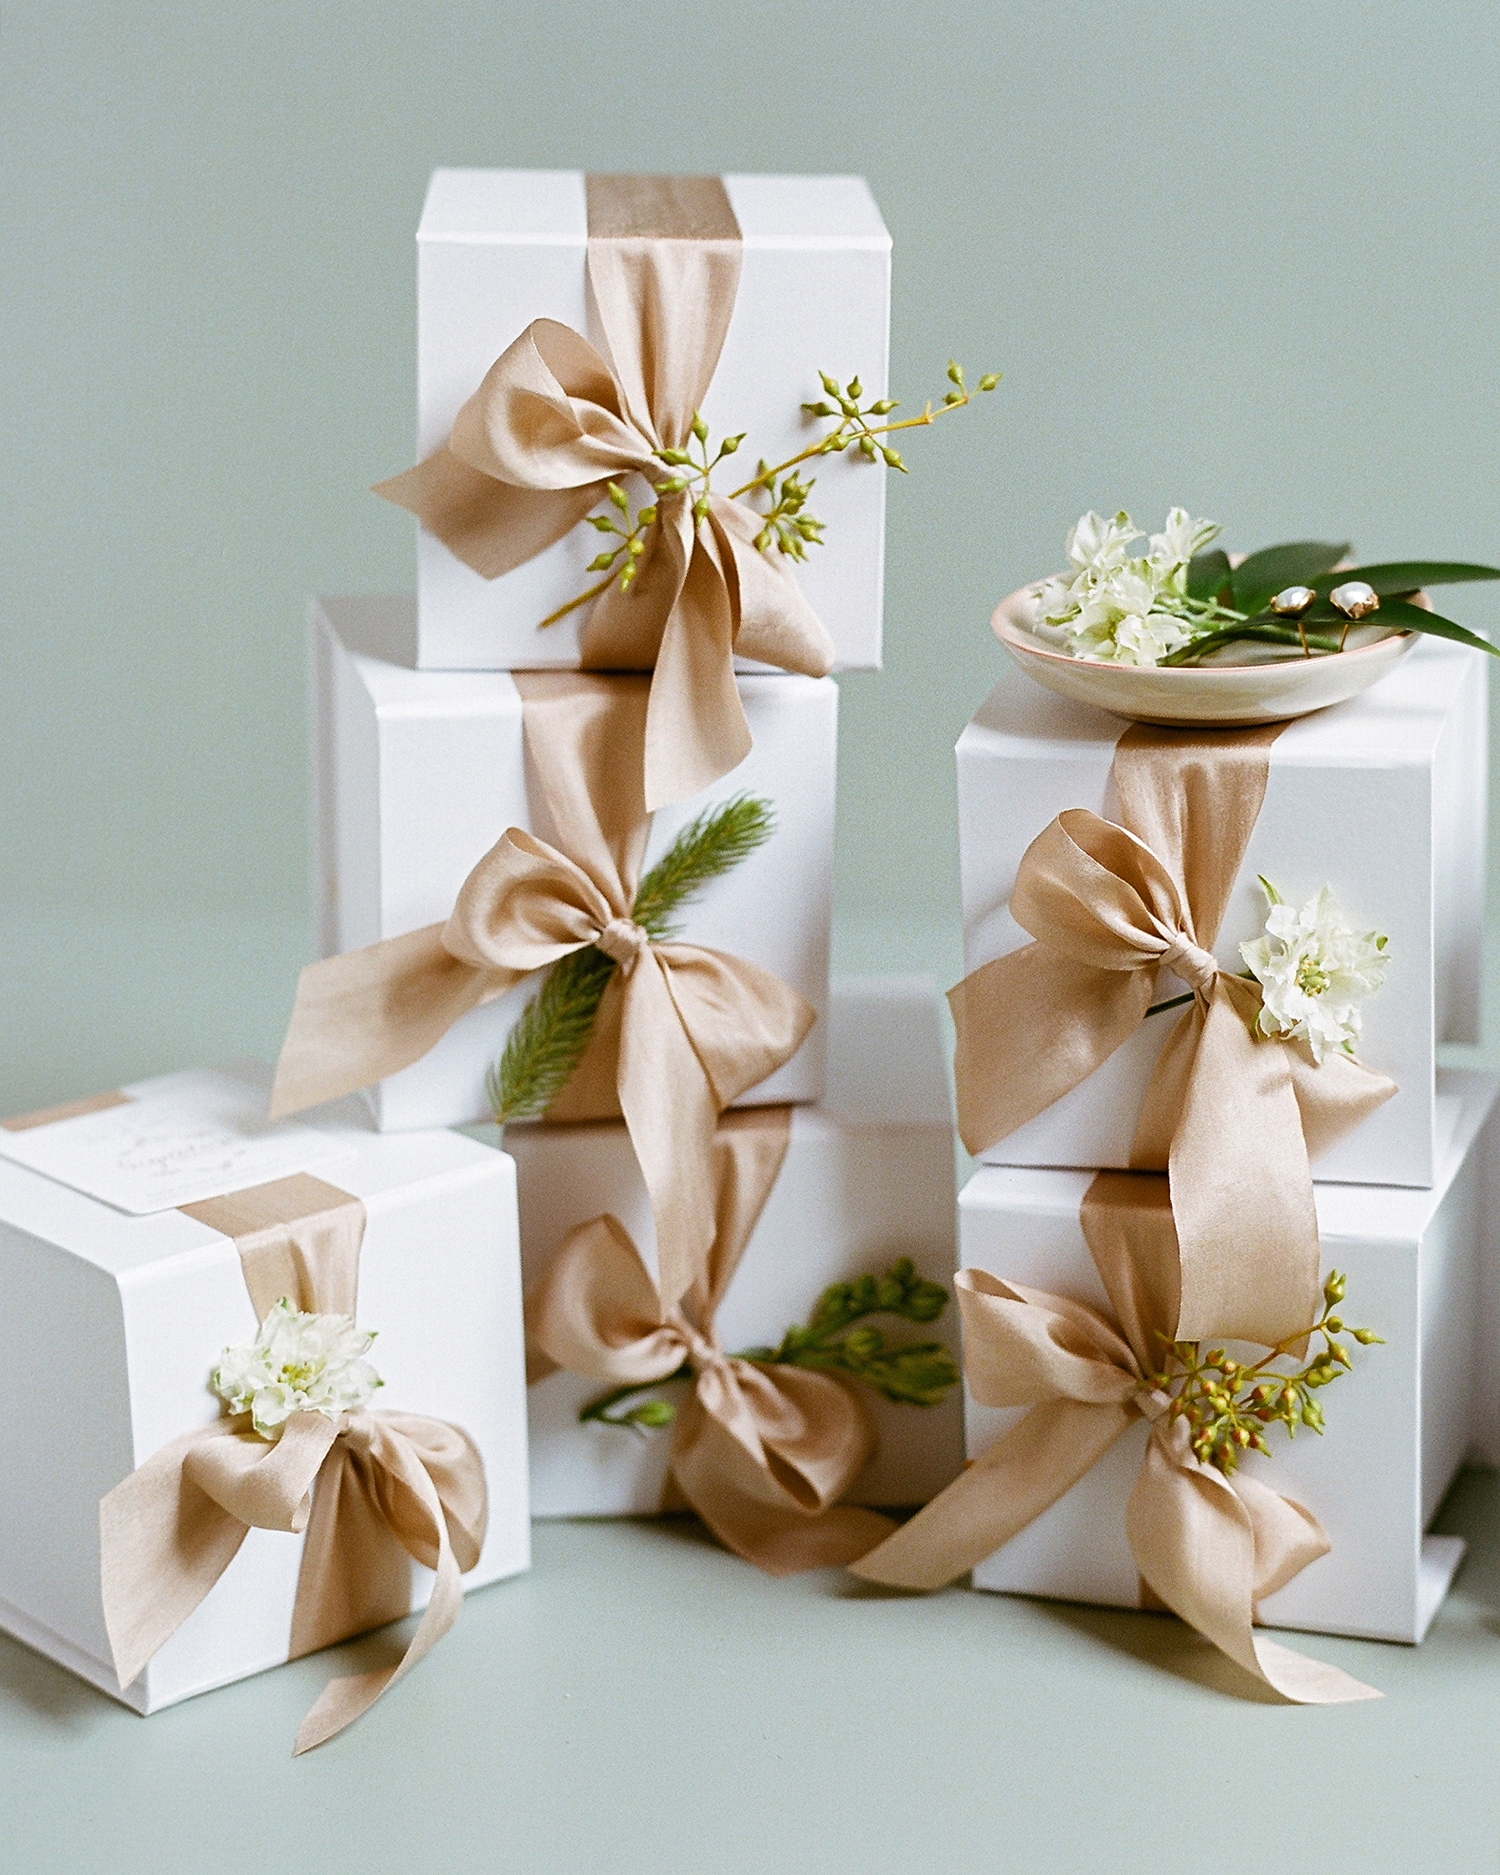 lindsay evan wedding boxes with ribbon